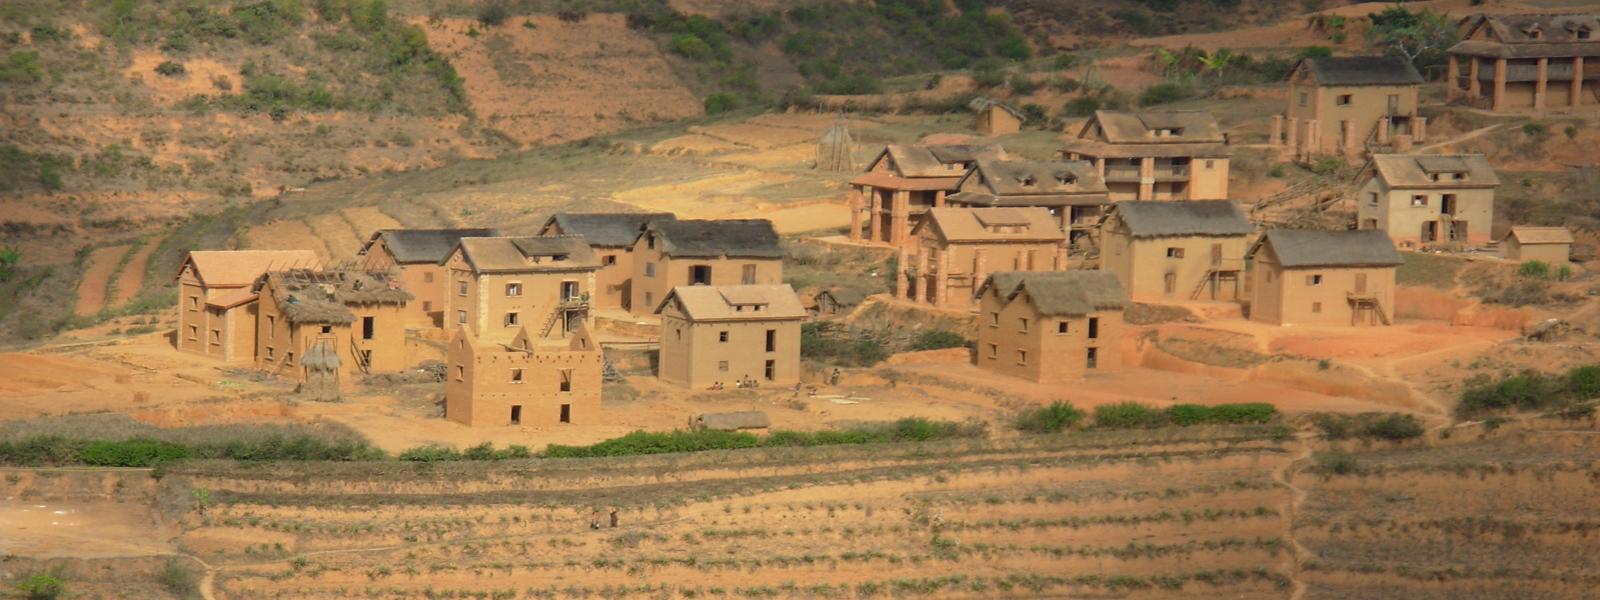 Village des hautes terres